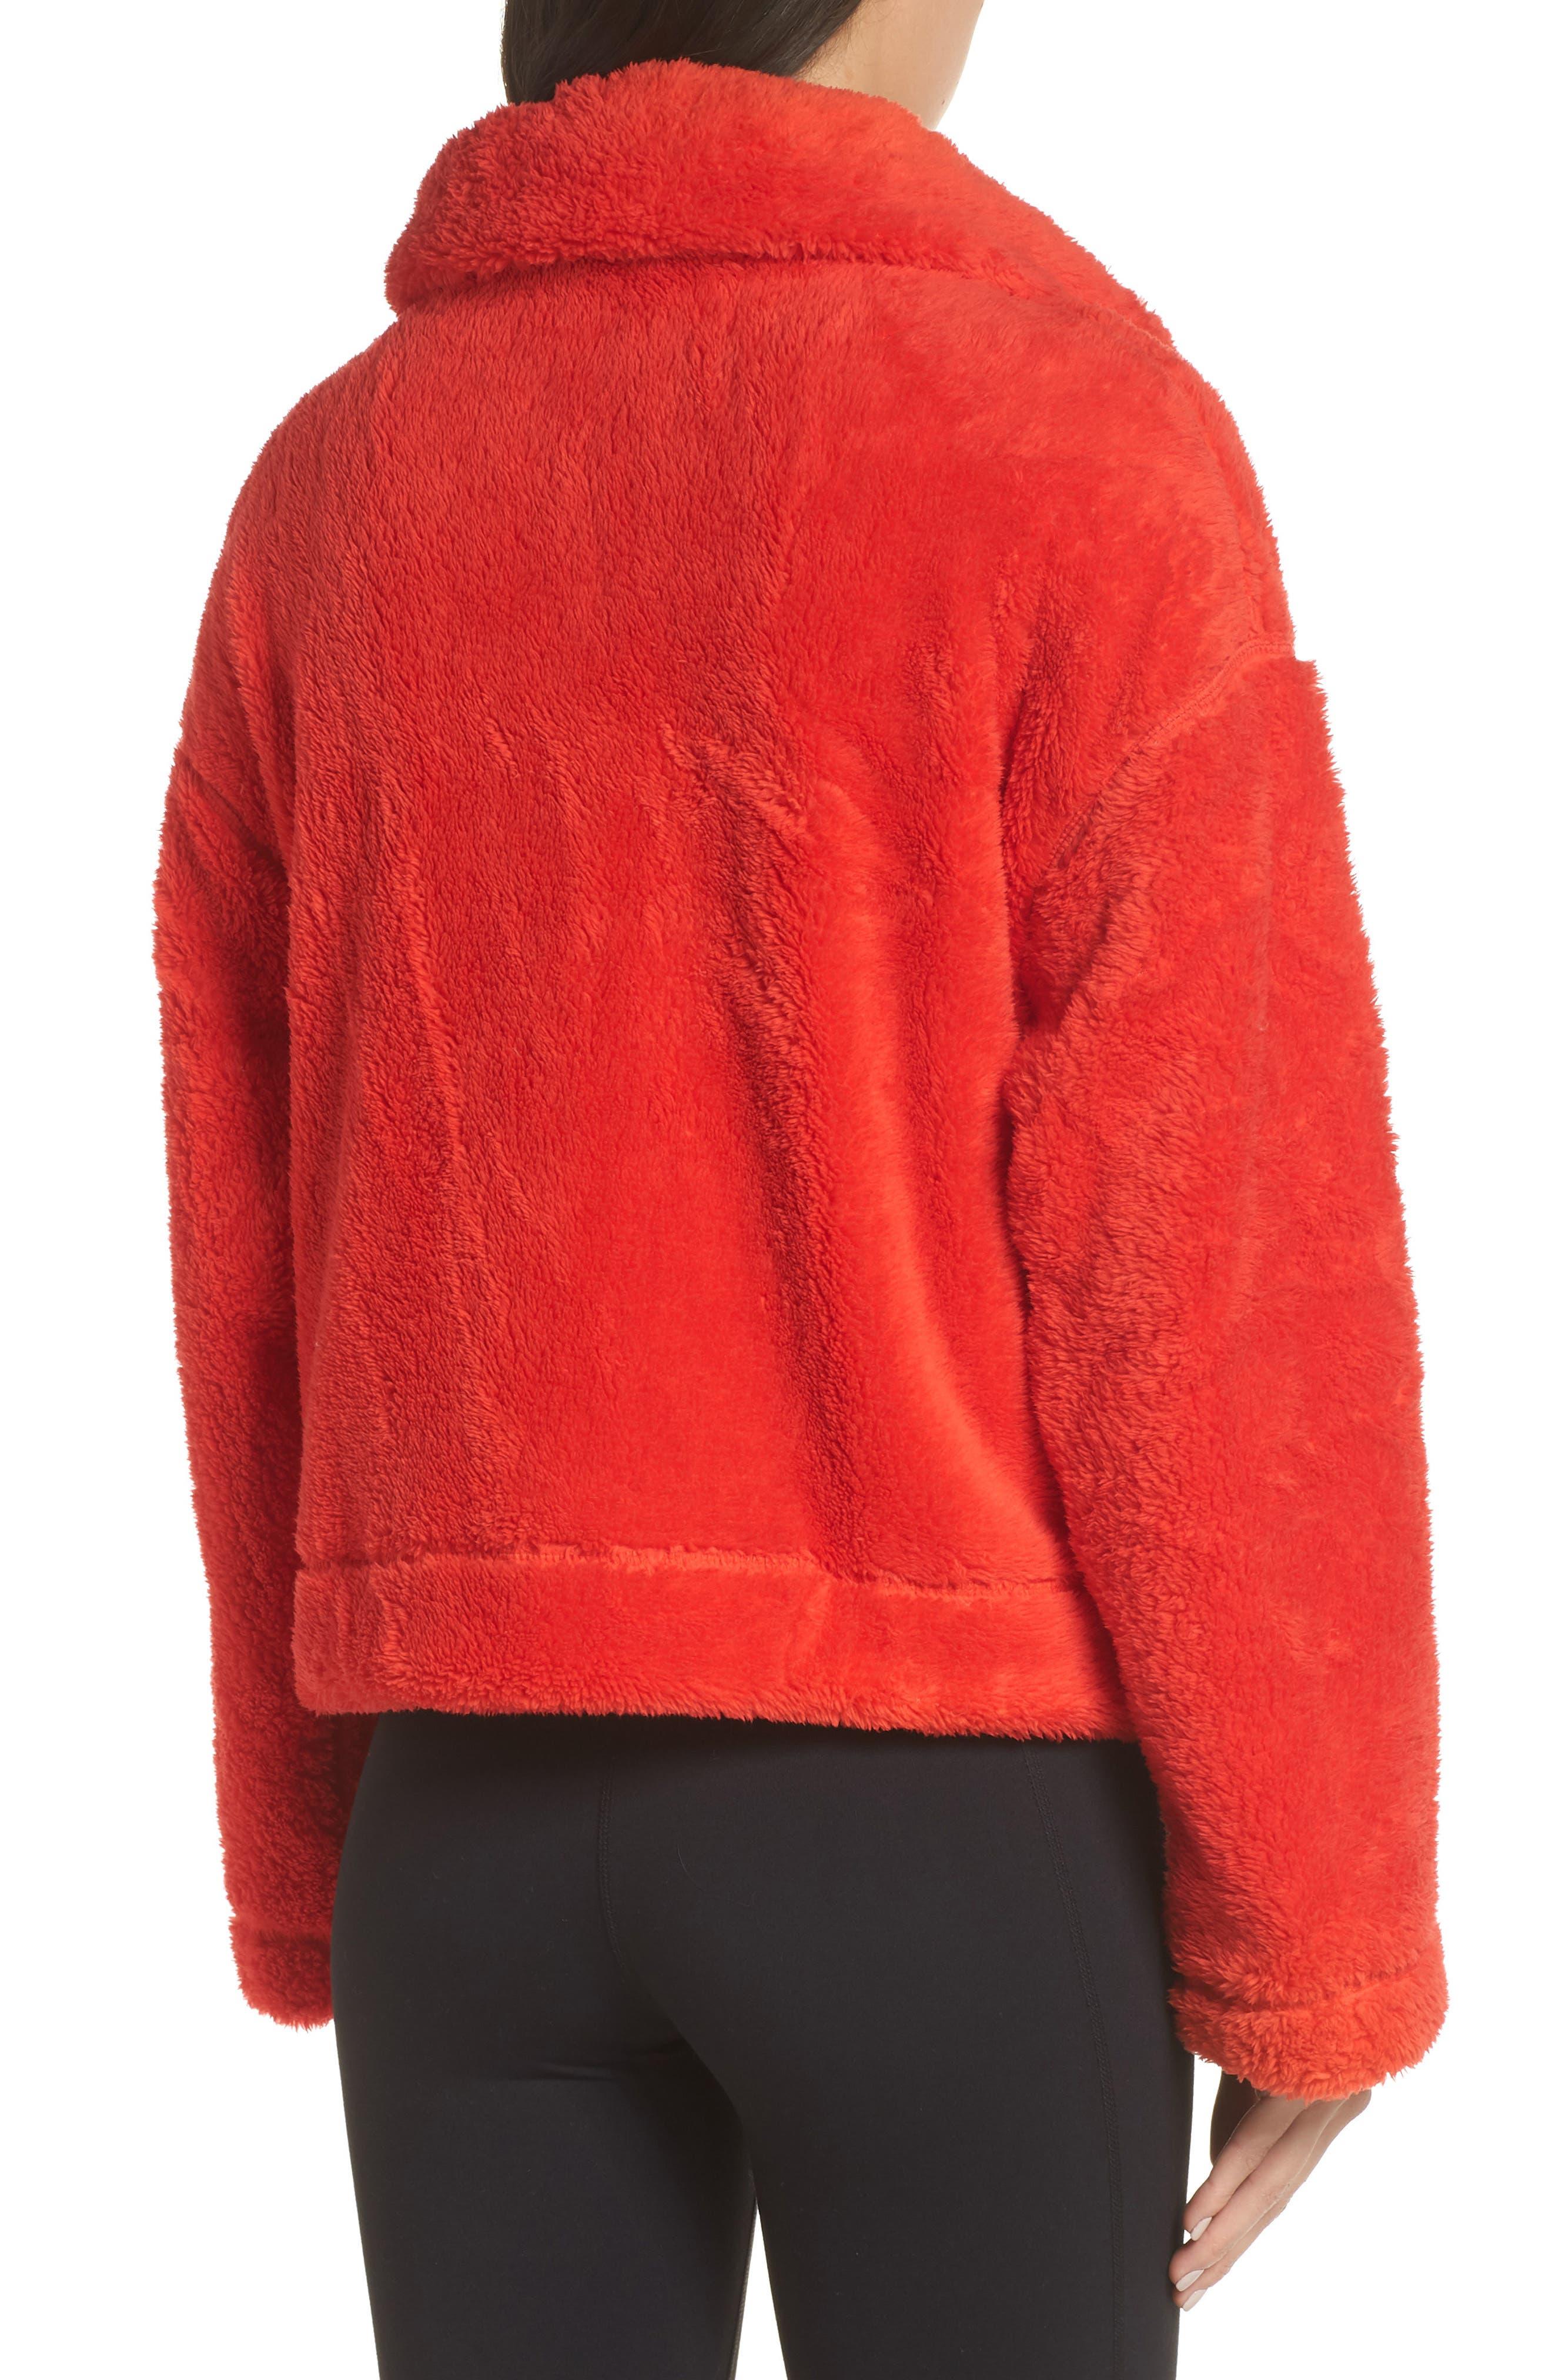 Dazed Fleece Jacket,                             Alternate thumbnail 2, color,                             RED